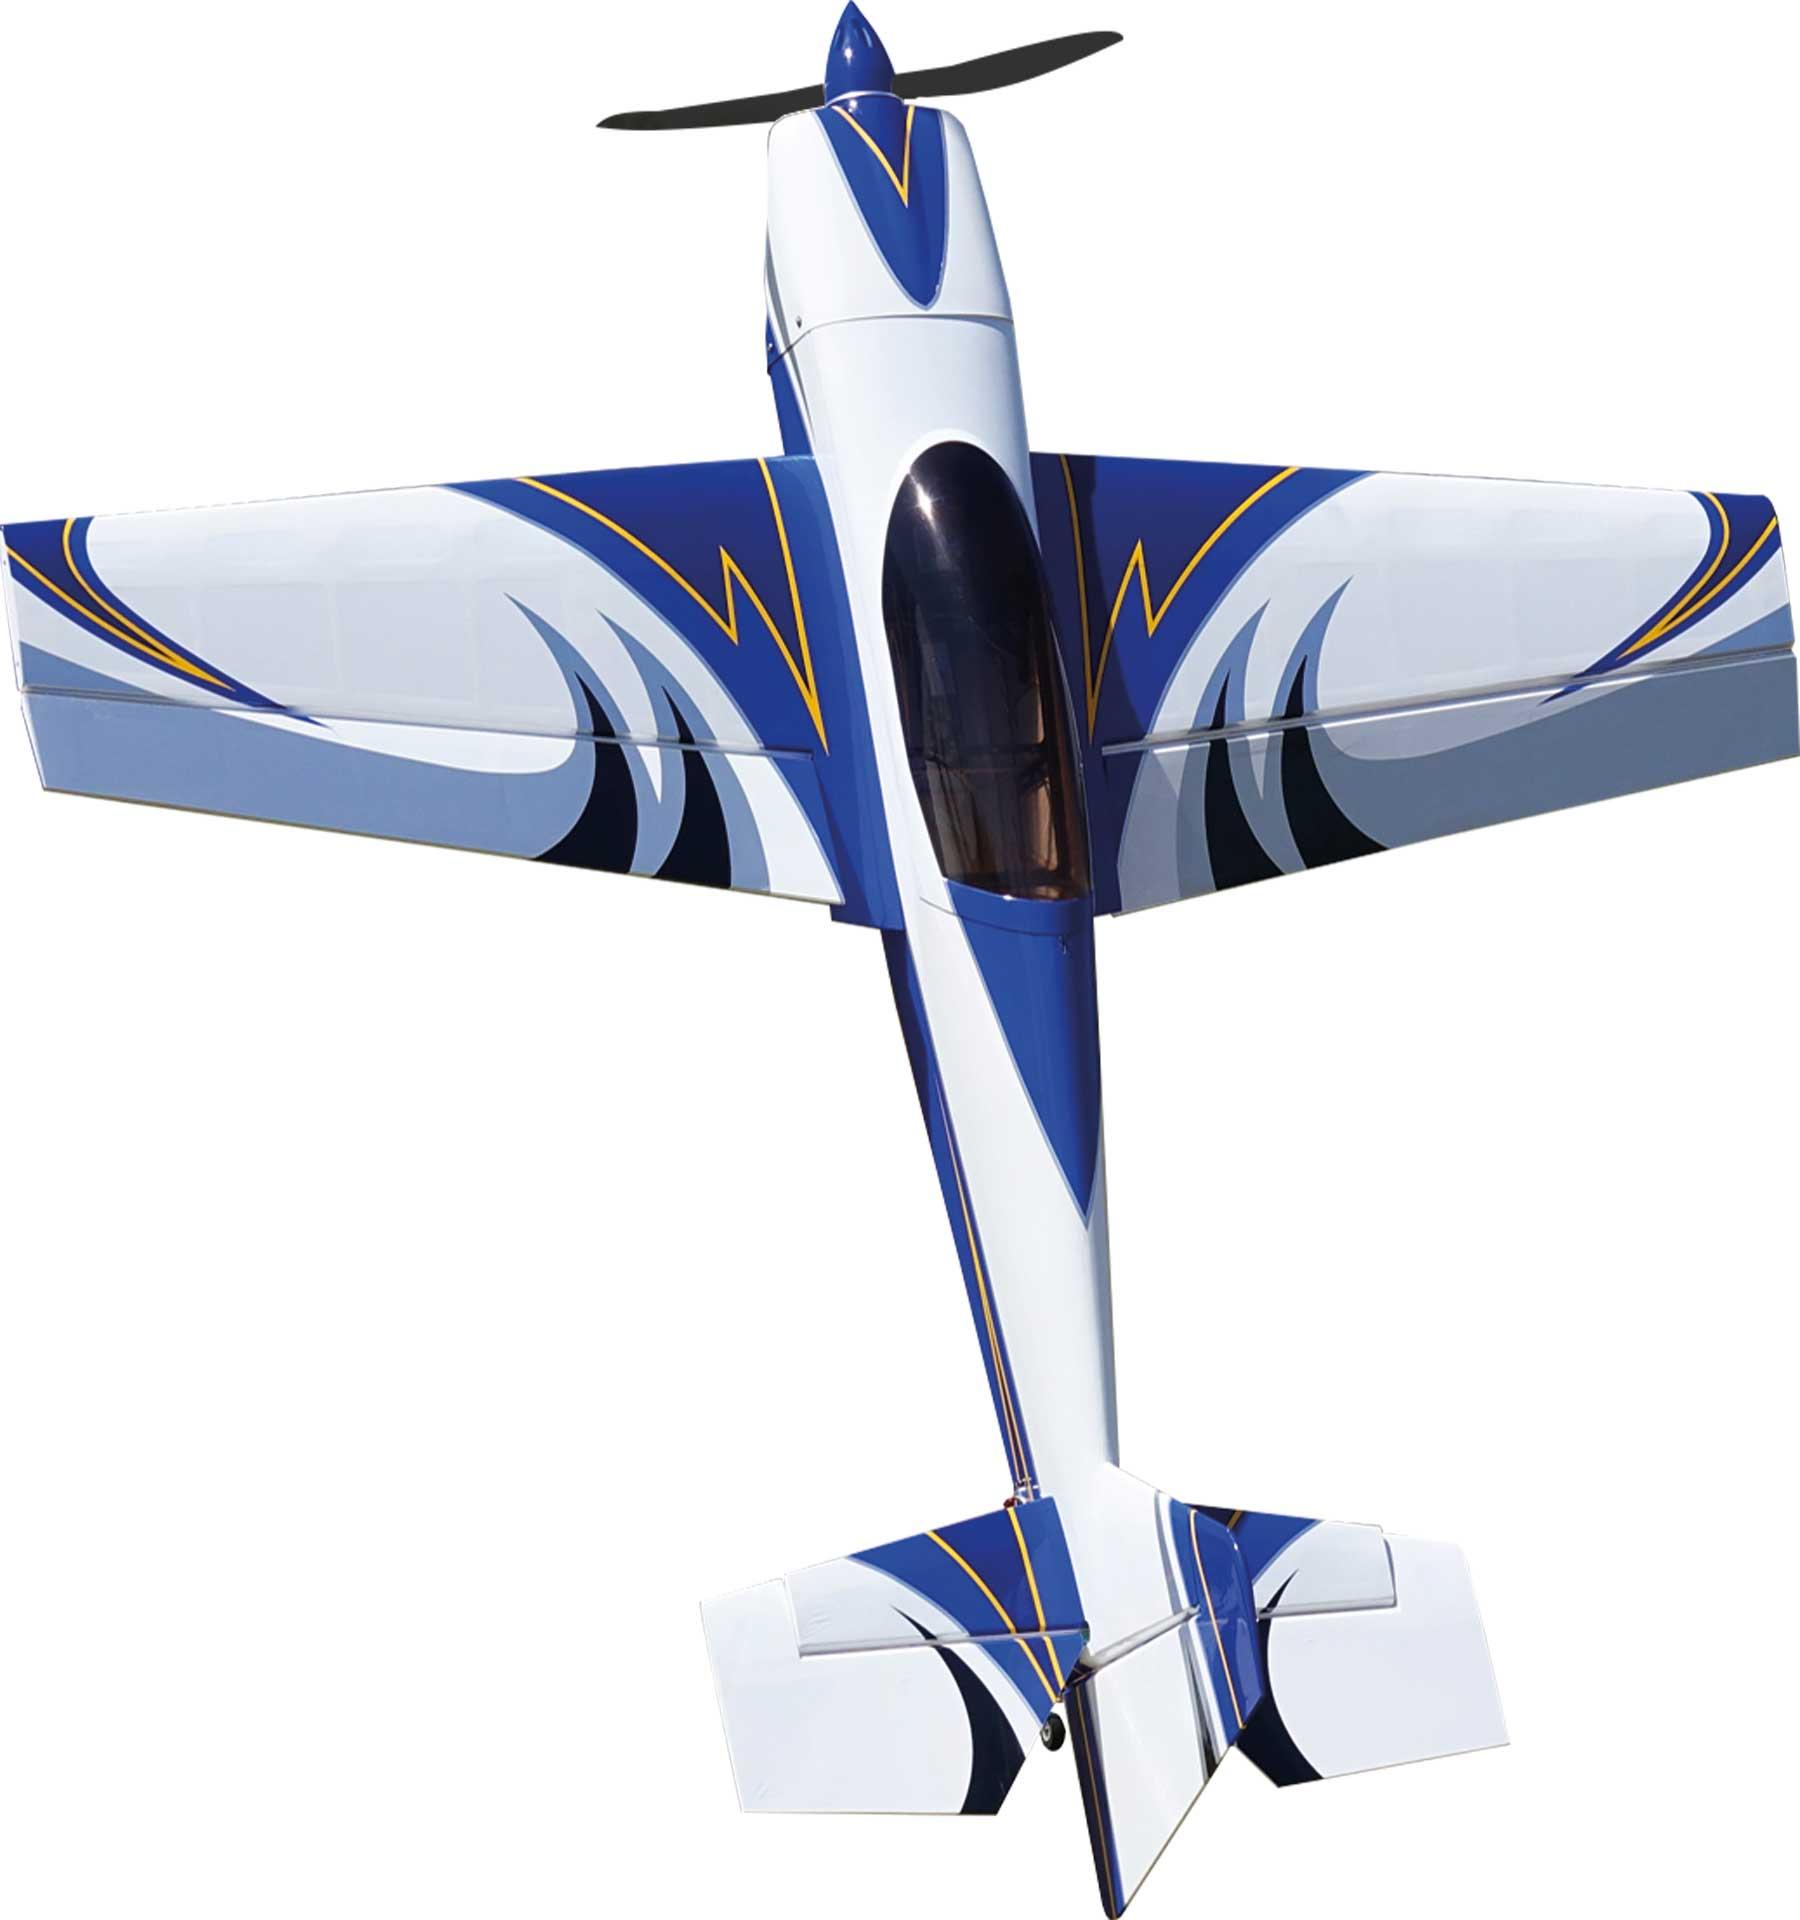 "EXTREMEFLIGHT-RC Extra NG 60"" Blue/White ARF"